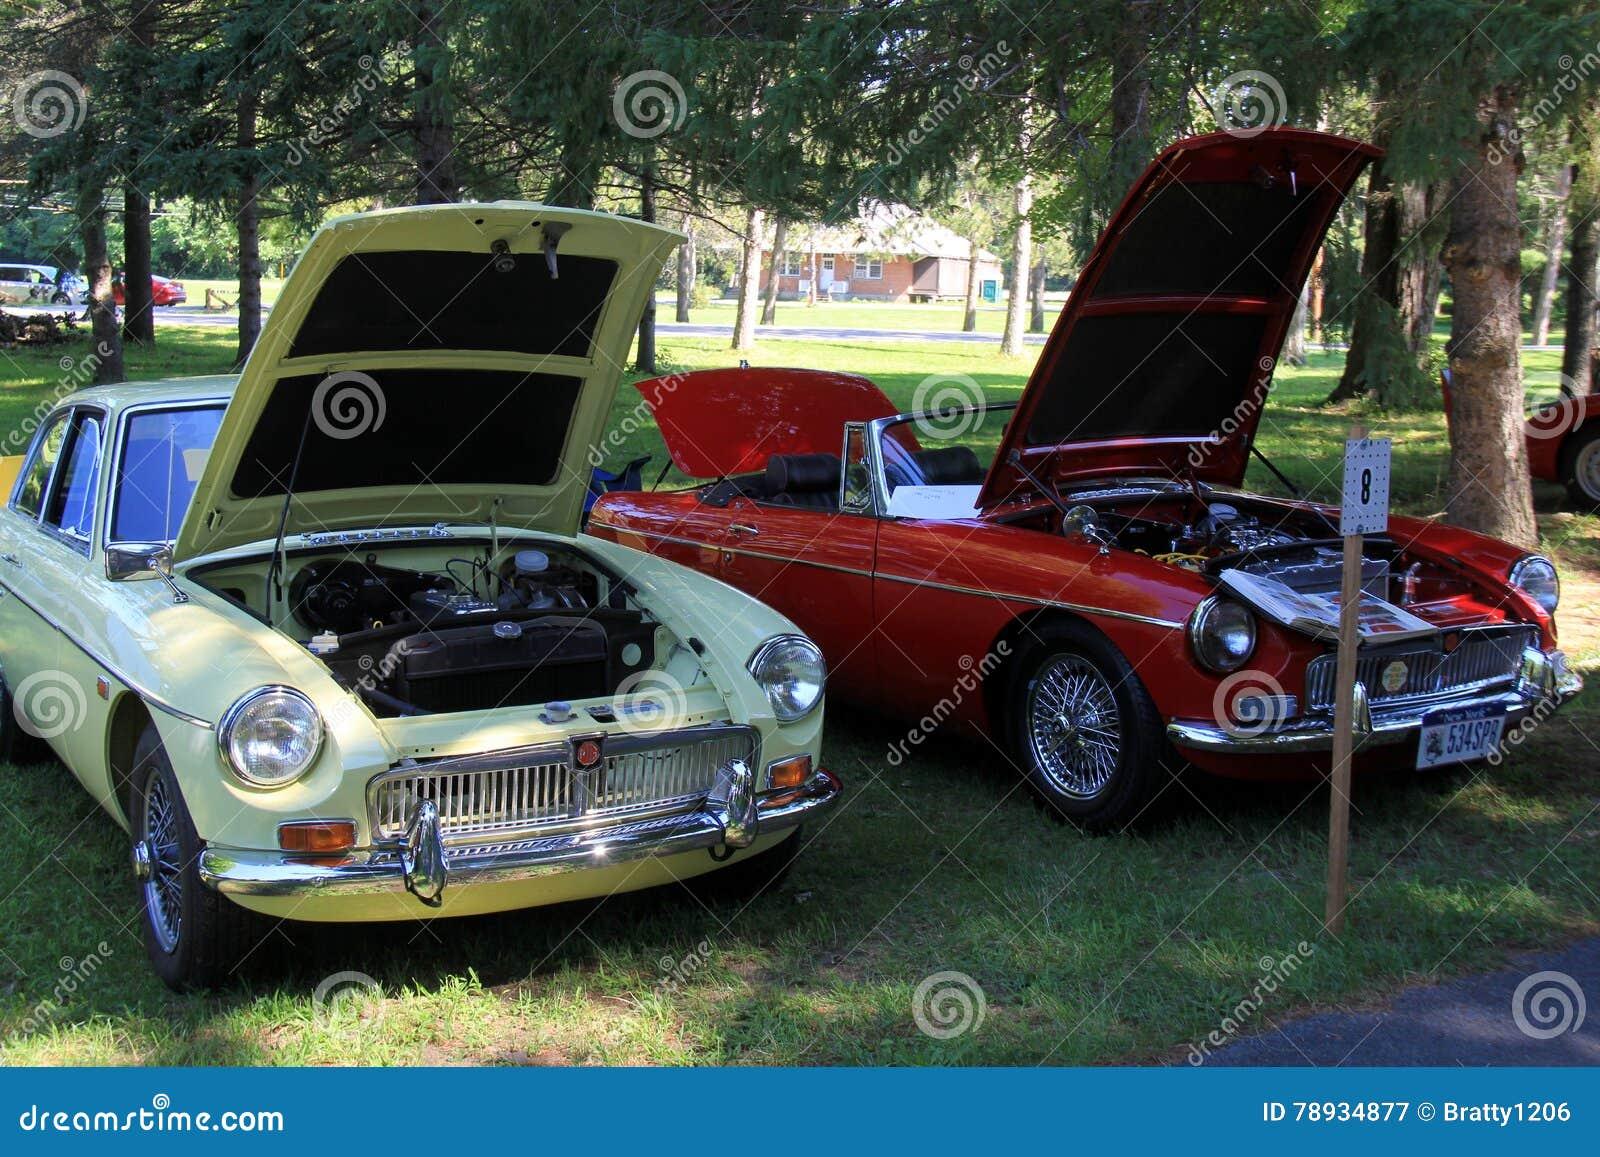 Beautiful Antique Cars Hoods Open For Visitors To AdmireSaratoga - Saratoga auto museum car show